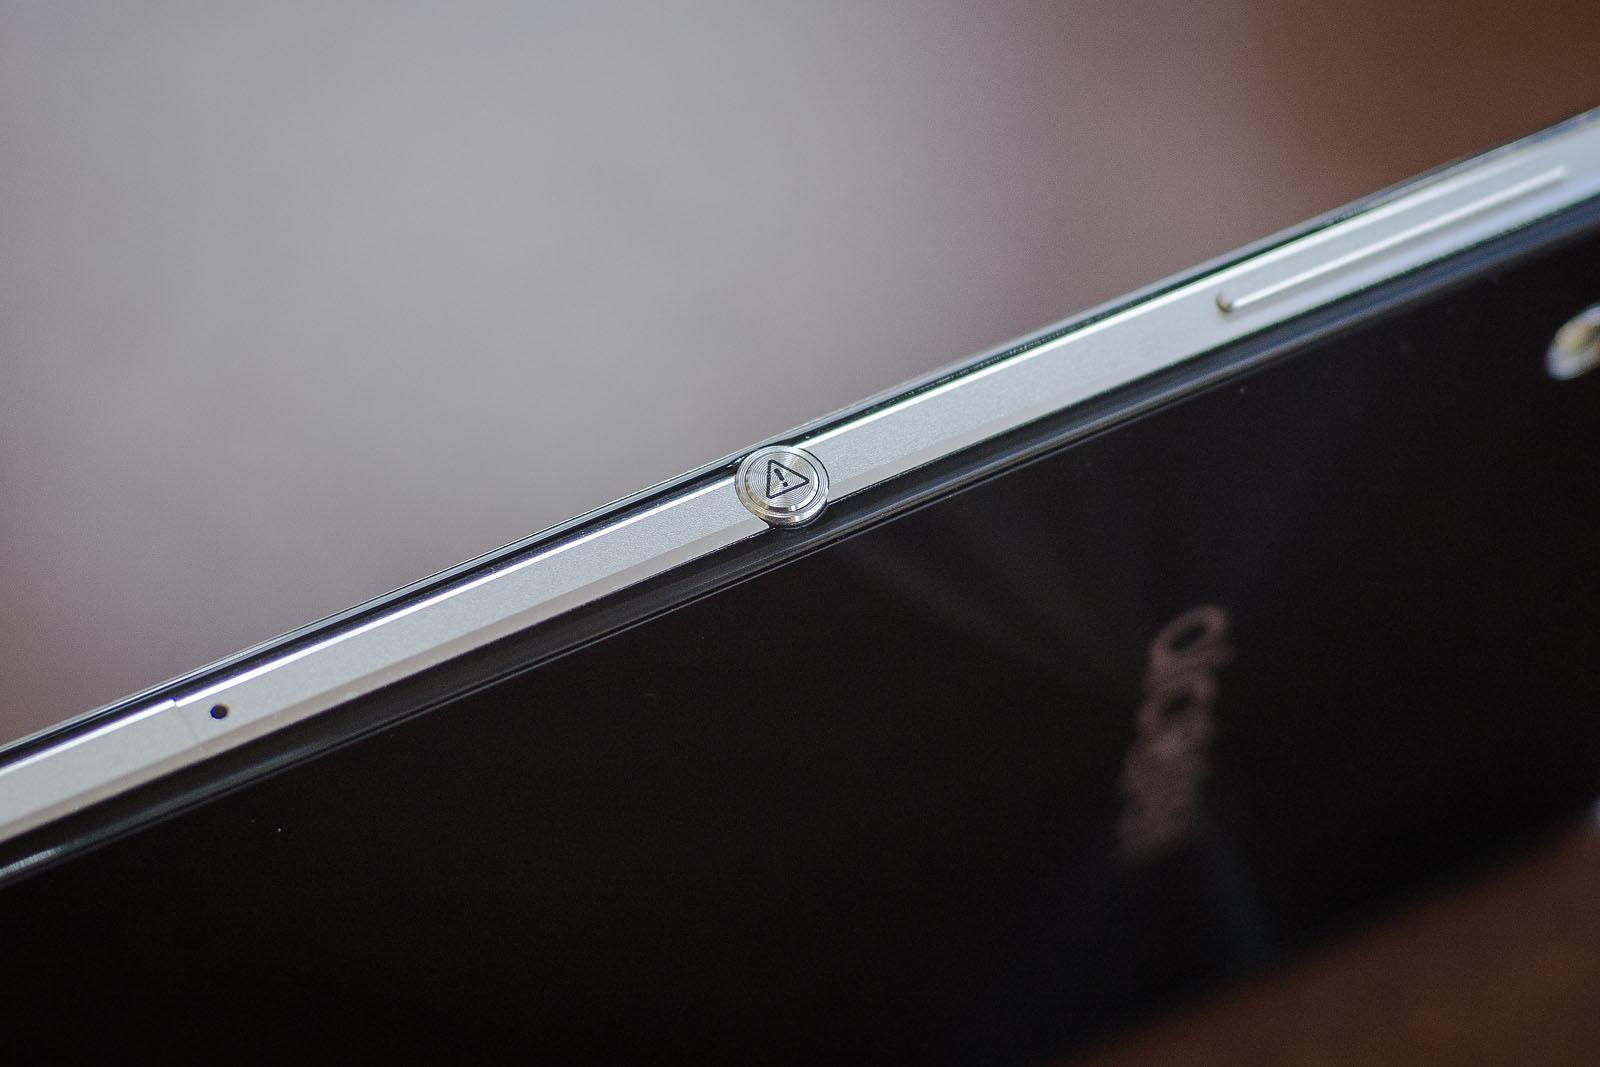 Review] Alcatel Idol 4 มือถือสุดงาม ที่มาพร้อมปุ่ม Boom